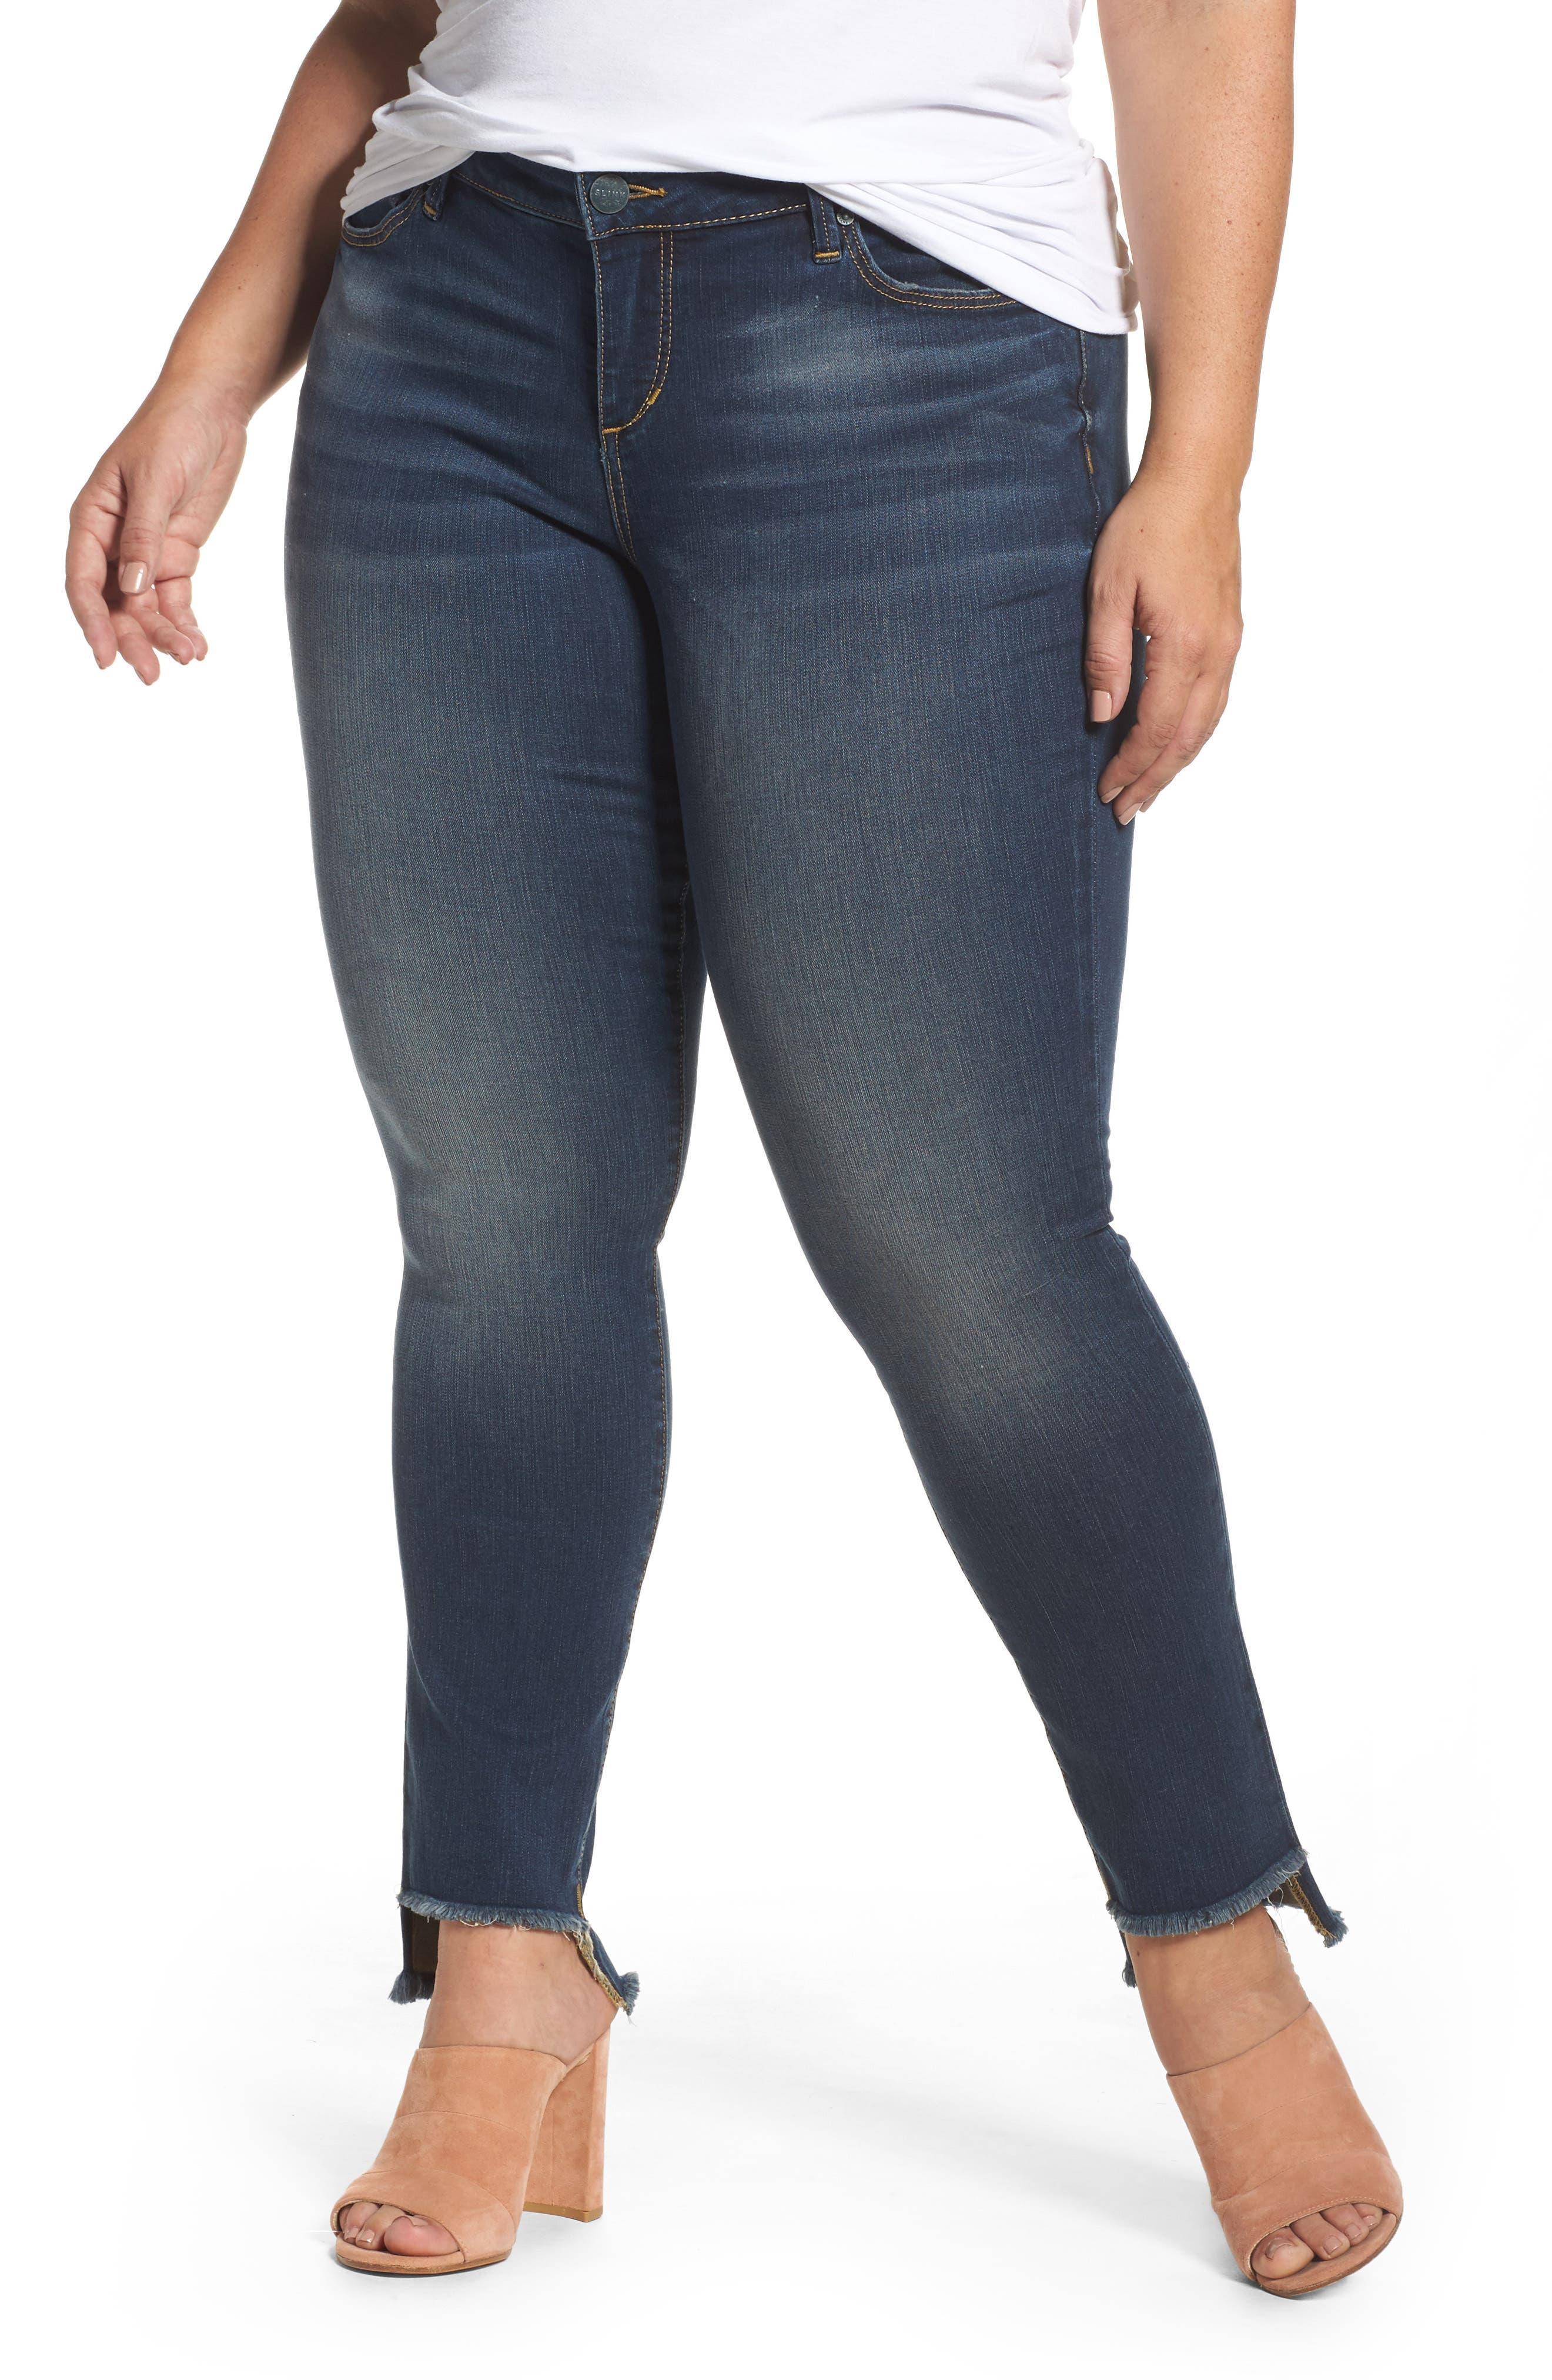 Main Image - SLINK Jeans Step Hem Skinny Jeans (Danielle) (Plus Size)